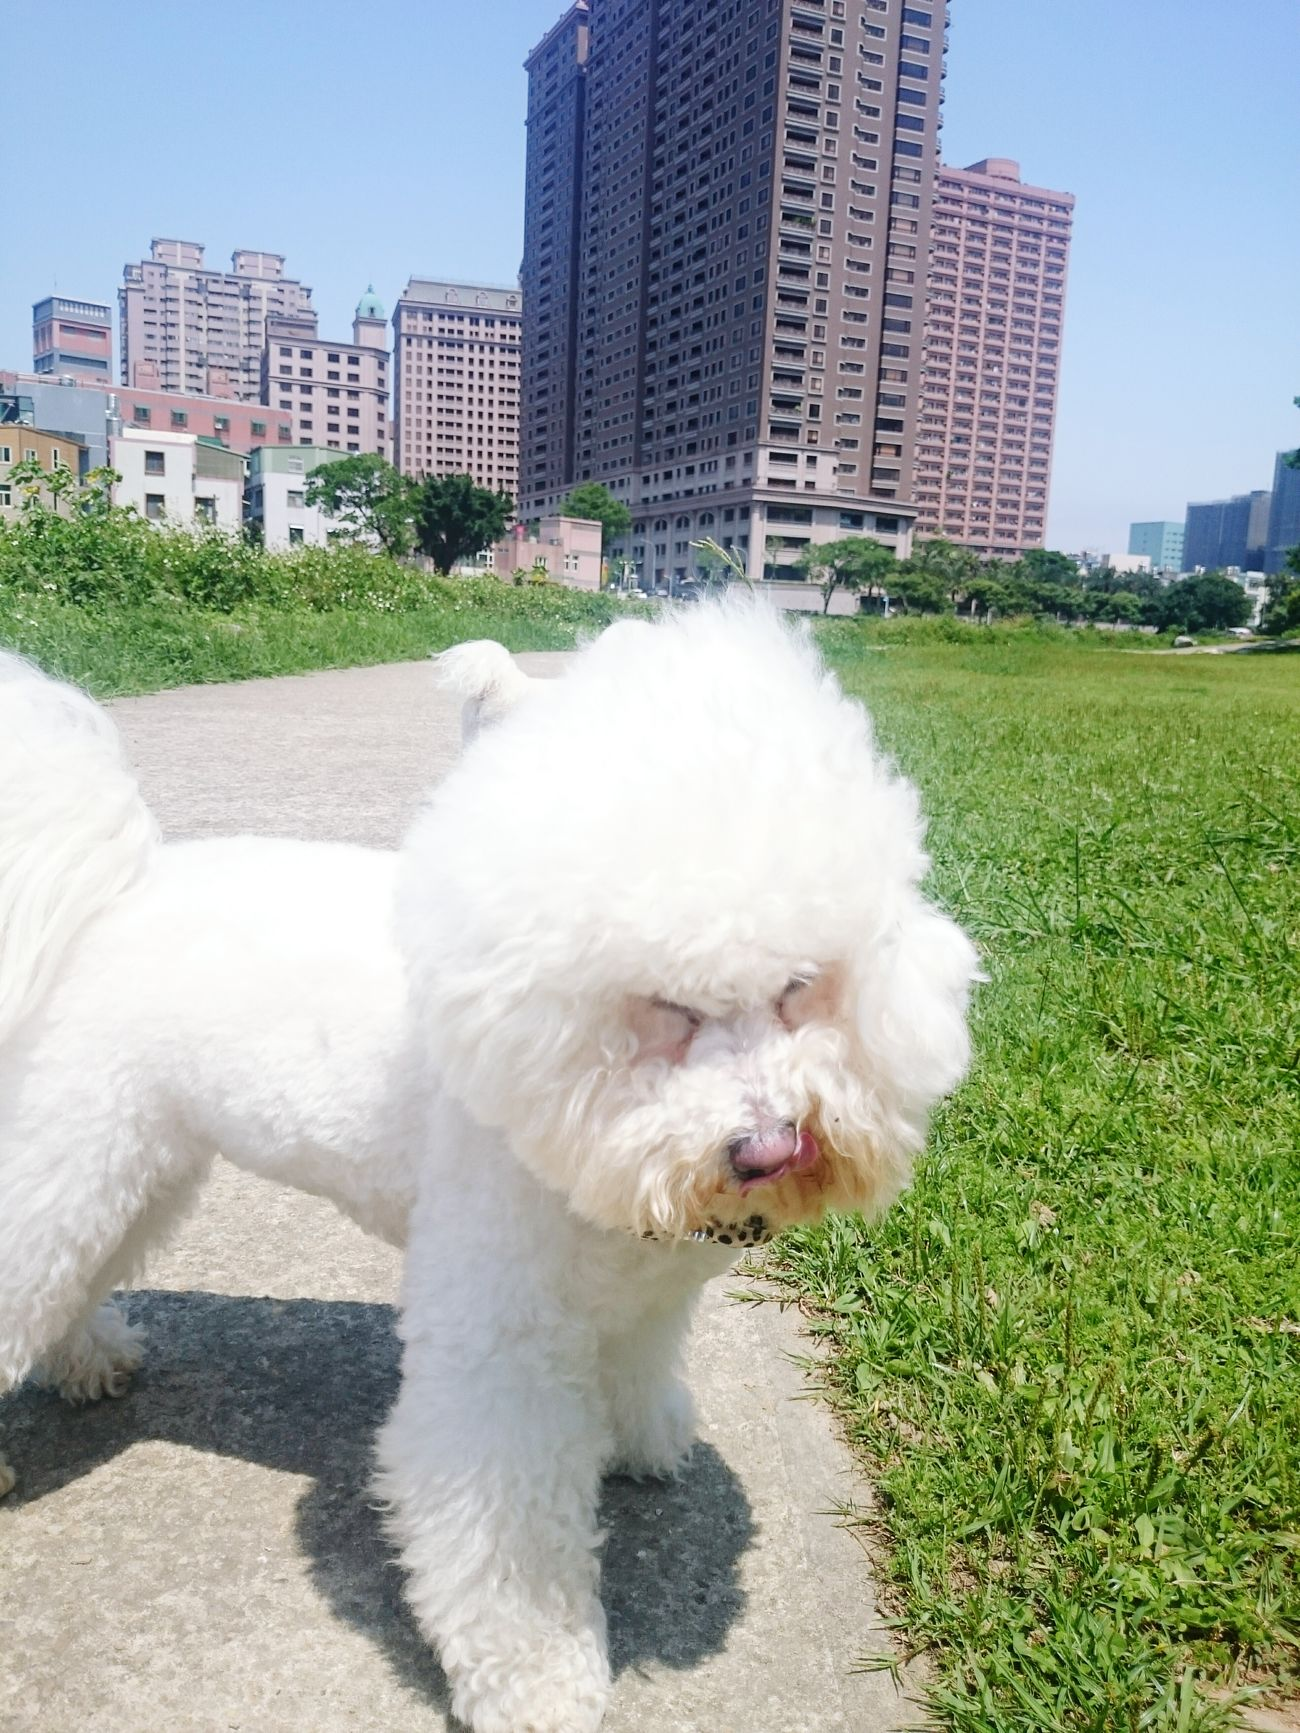 A windy day. Dog Pet Bichonfrise Bichon 比熊犬 比熊 ビションフリーゼ 狗 小狗 Puppy